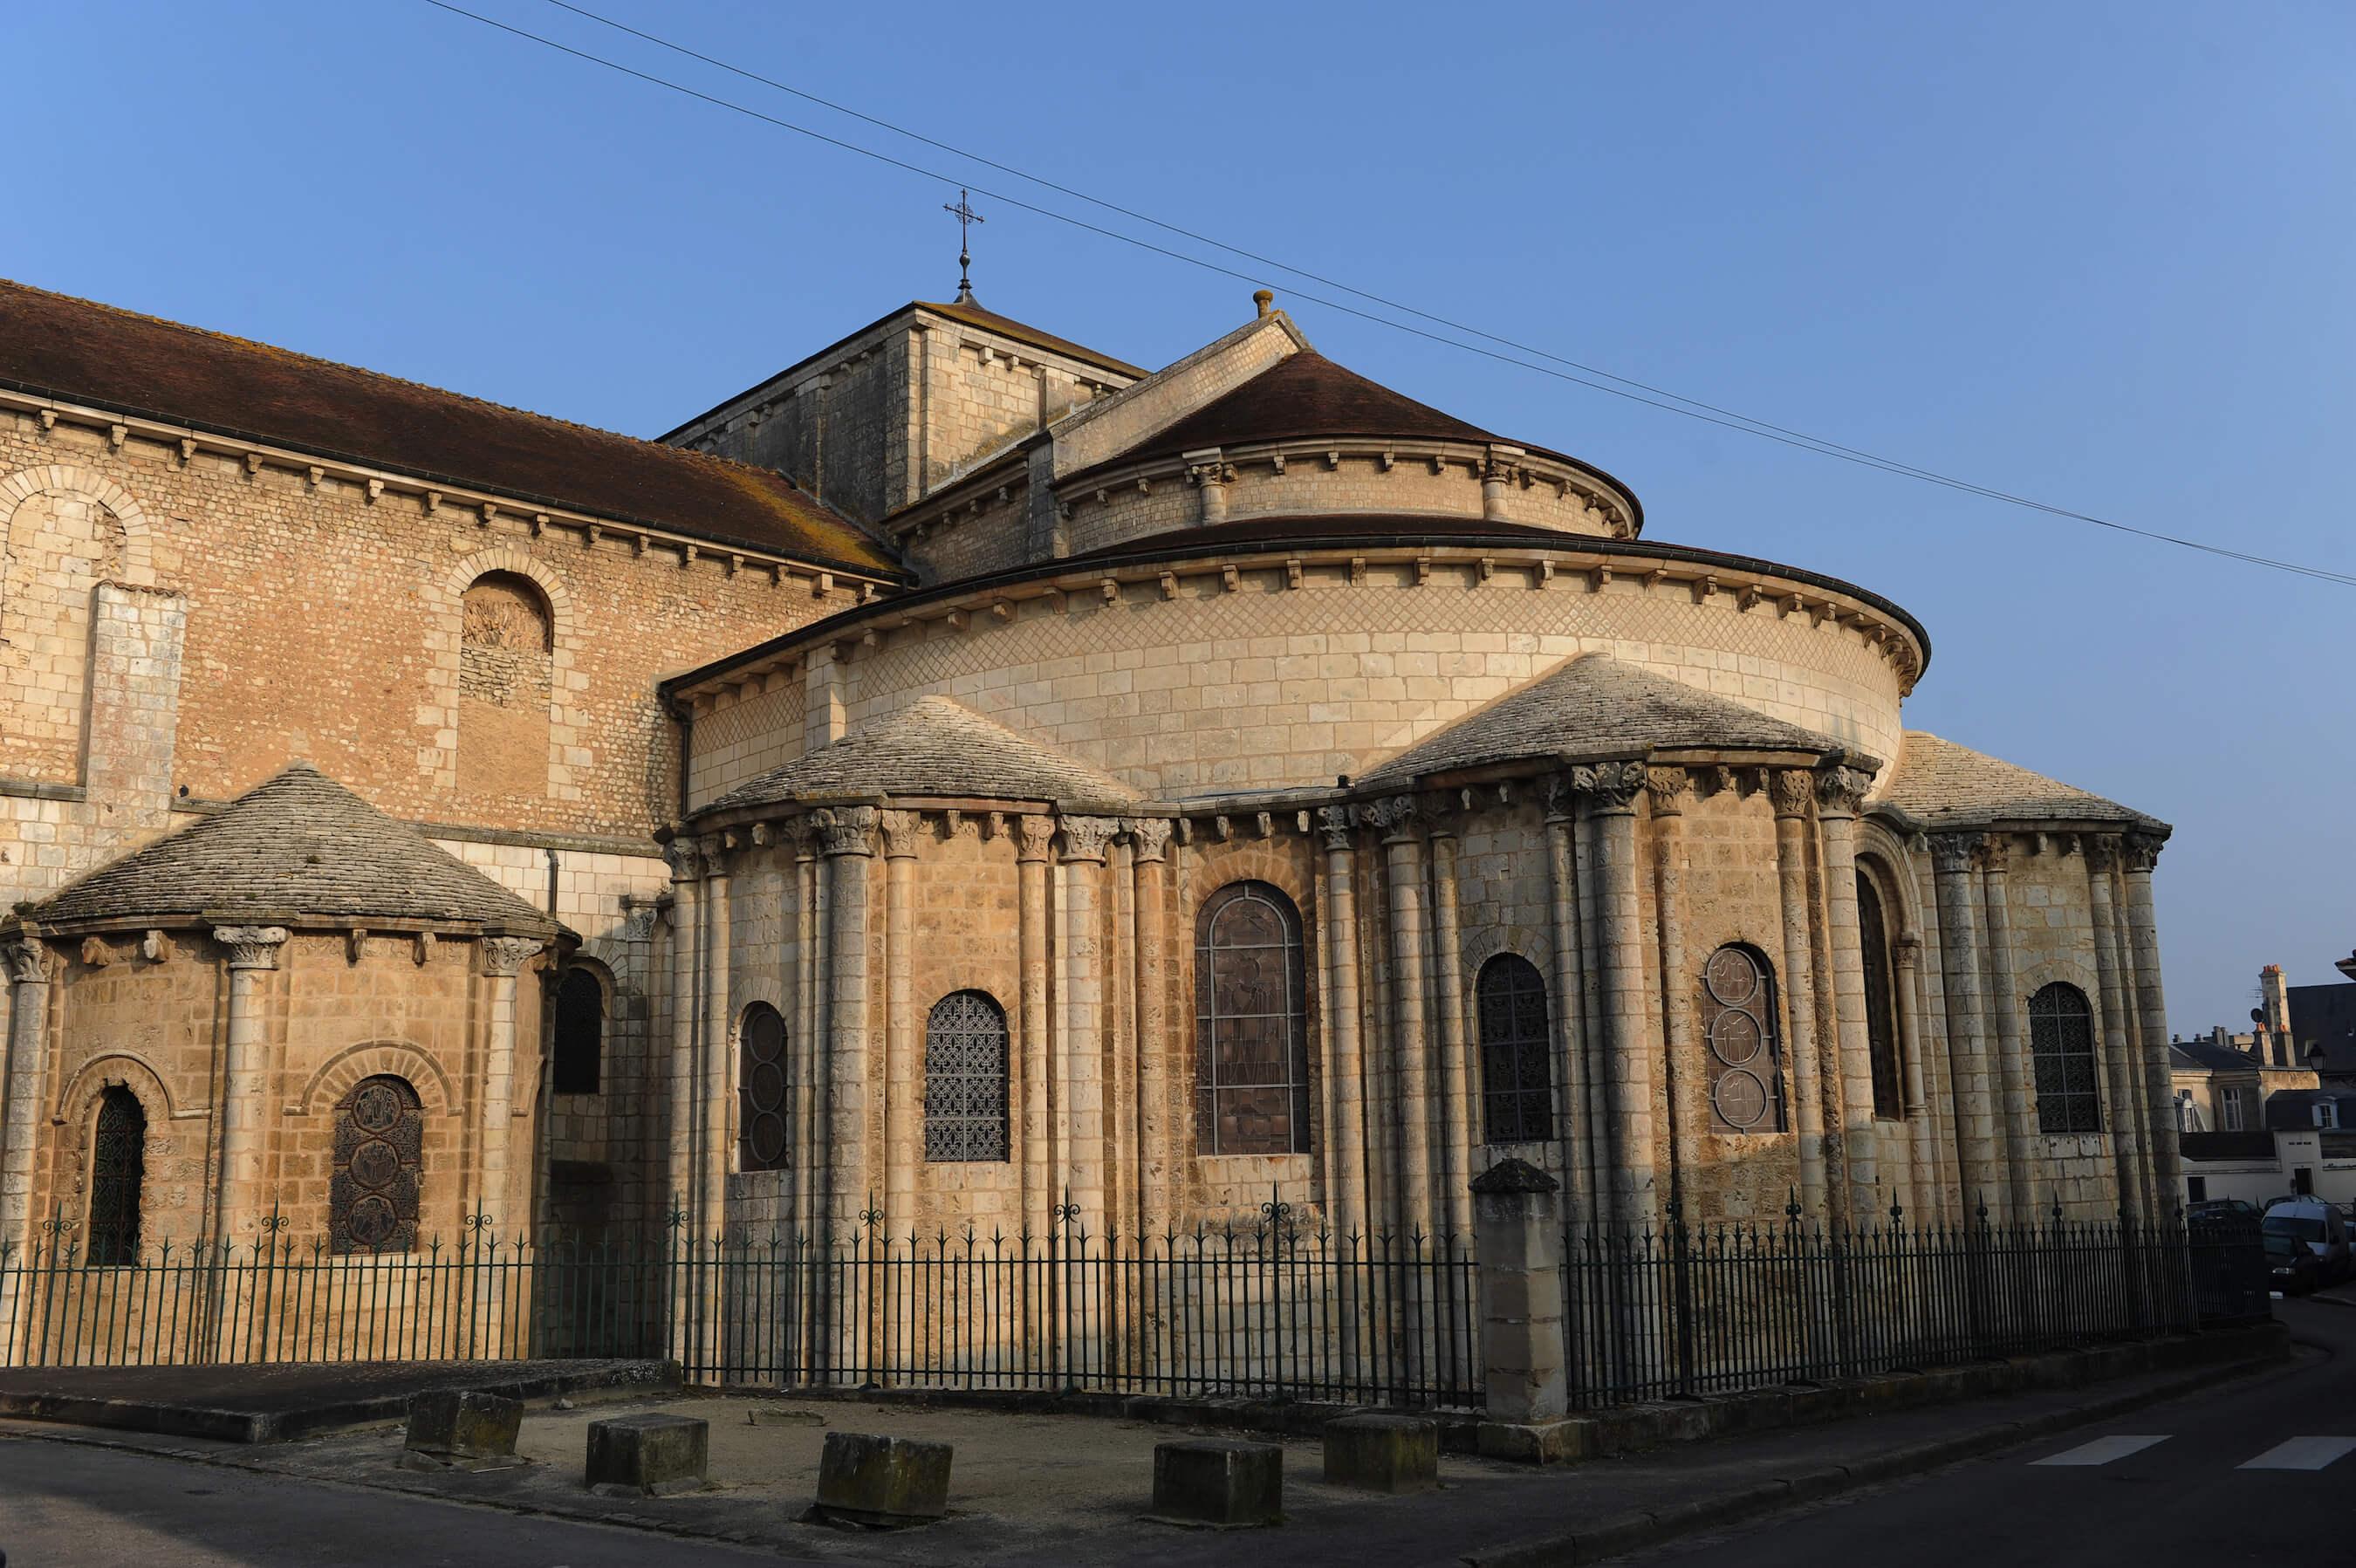 Eglise Saint-Hilaire-le-Grand©ACIR / JJ Gelbart